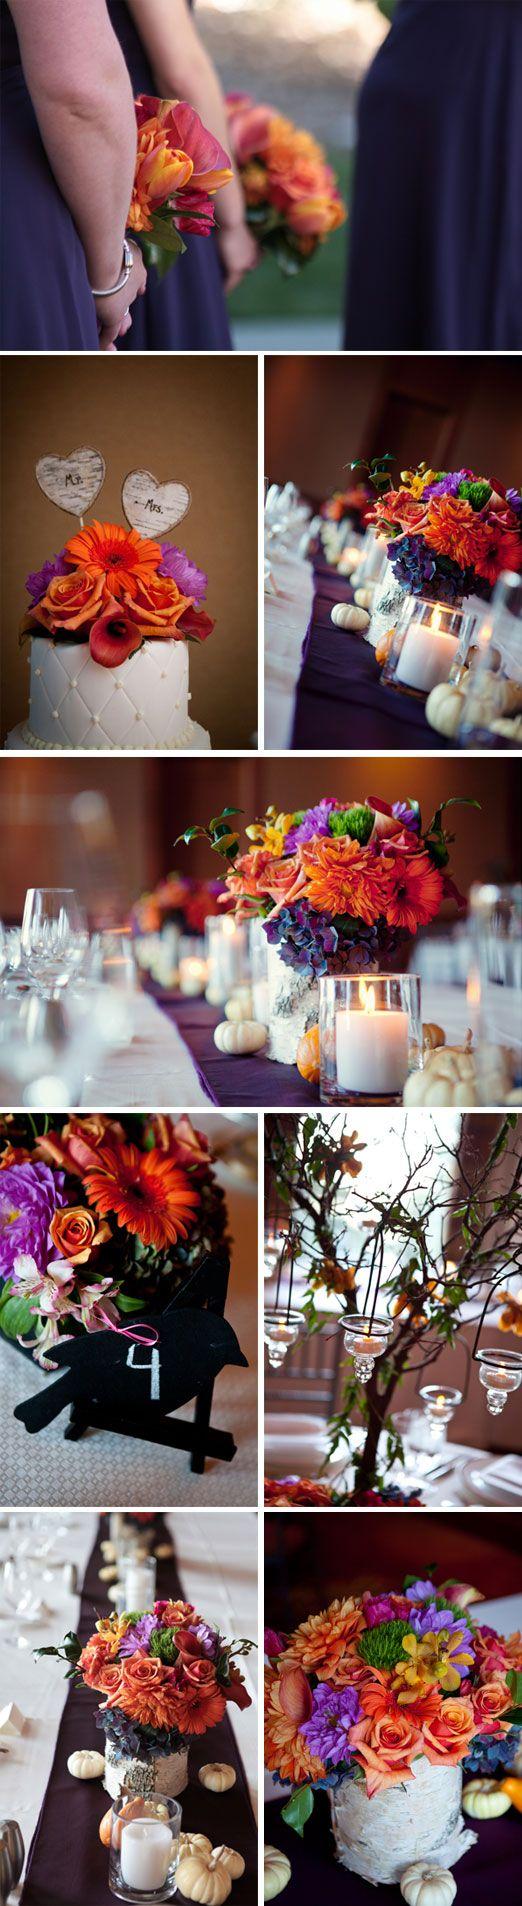 Rustic Elegance in Tahoe | Luxe Mountain Weddings | Mountain Wedding Inspiration Rustic Elegance in Tahoe | Print Magazine & Blog Featuring Mountain Wedding Inspiration!